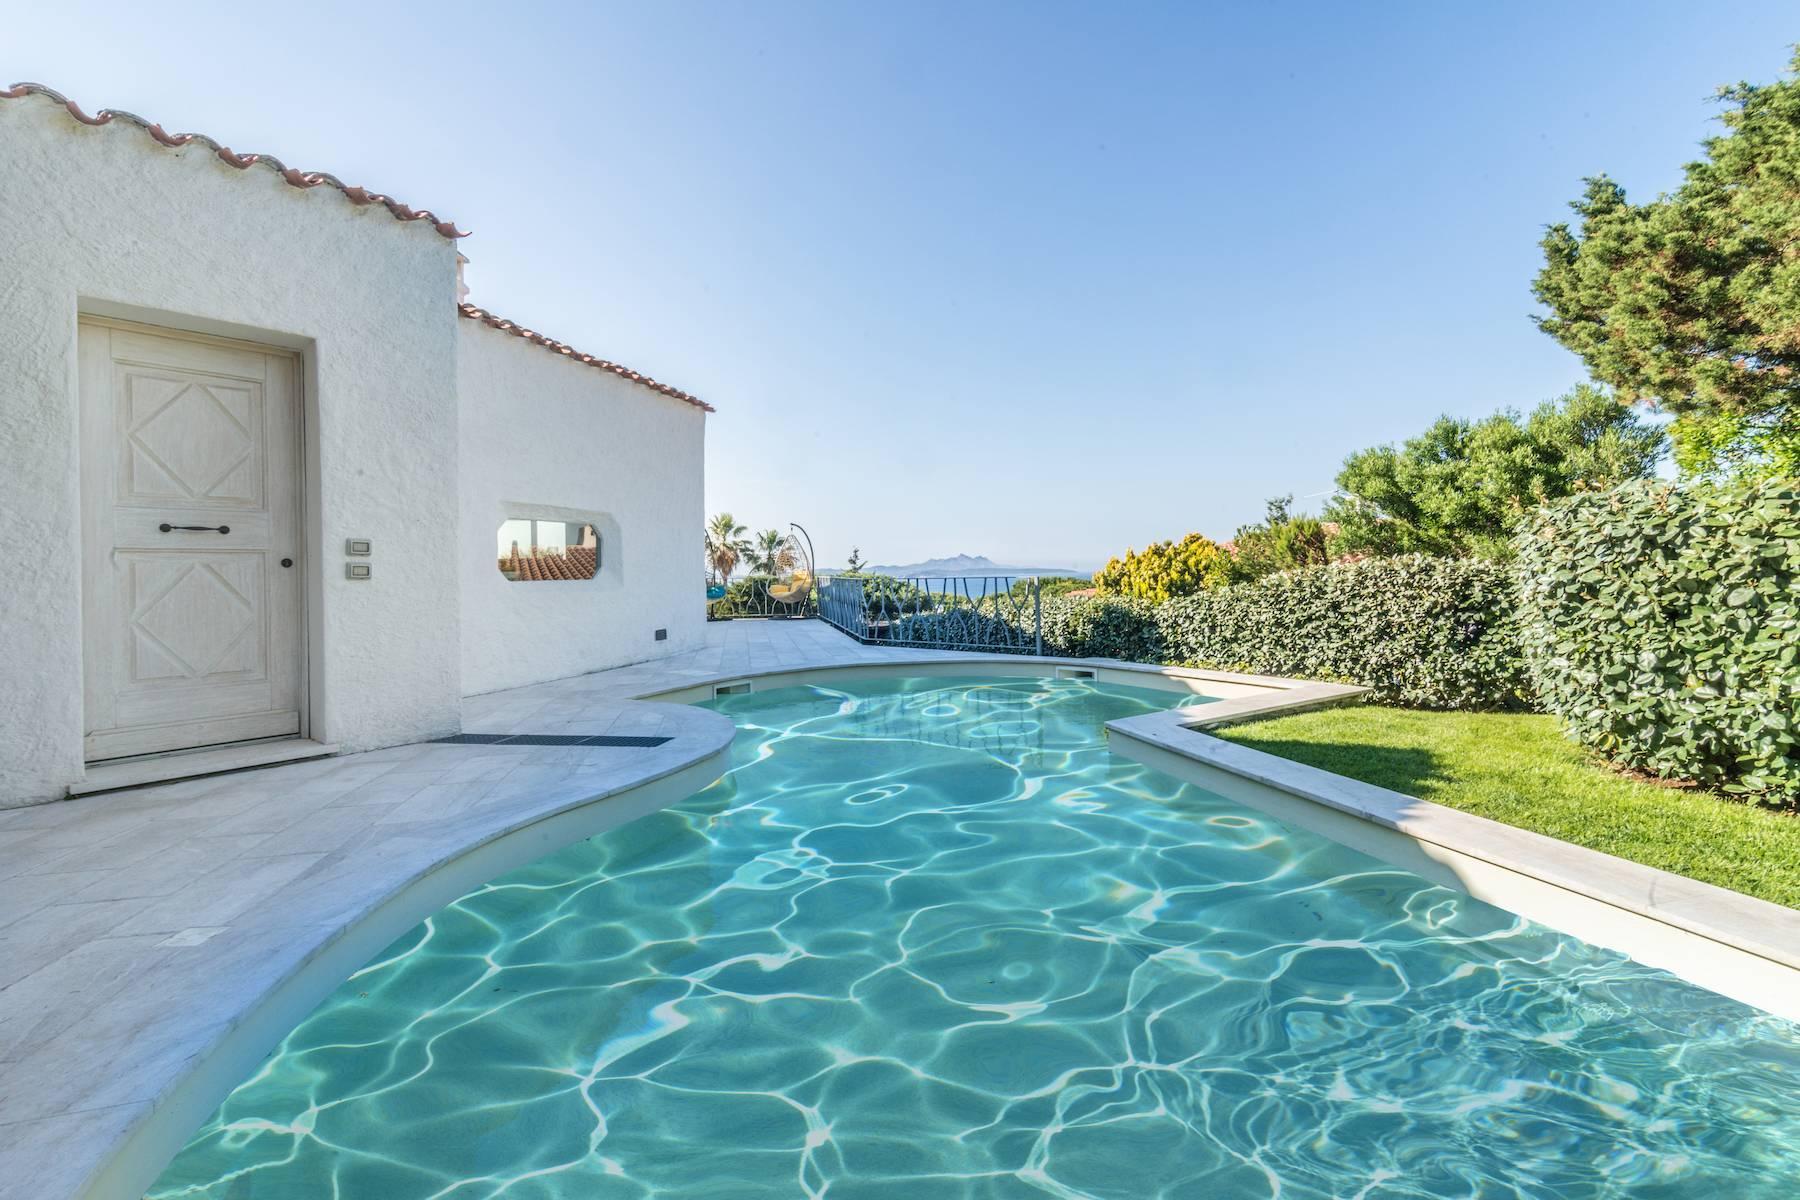 Villa confortable avec piscine privée à Baja Sardinia - 1